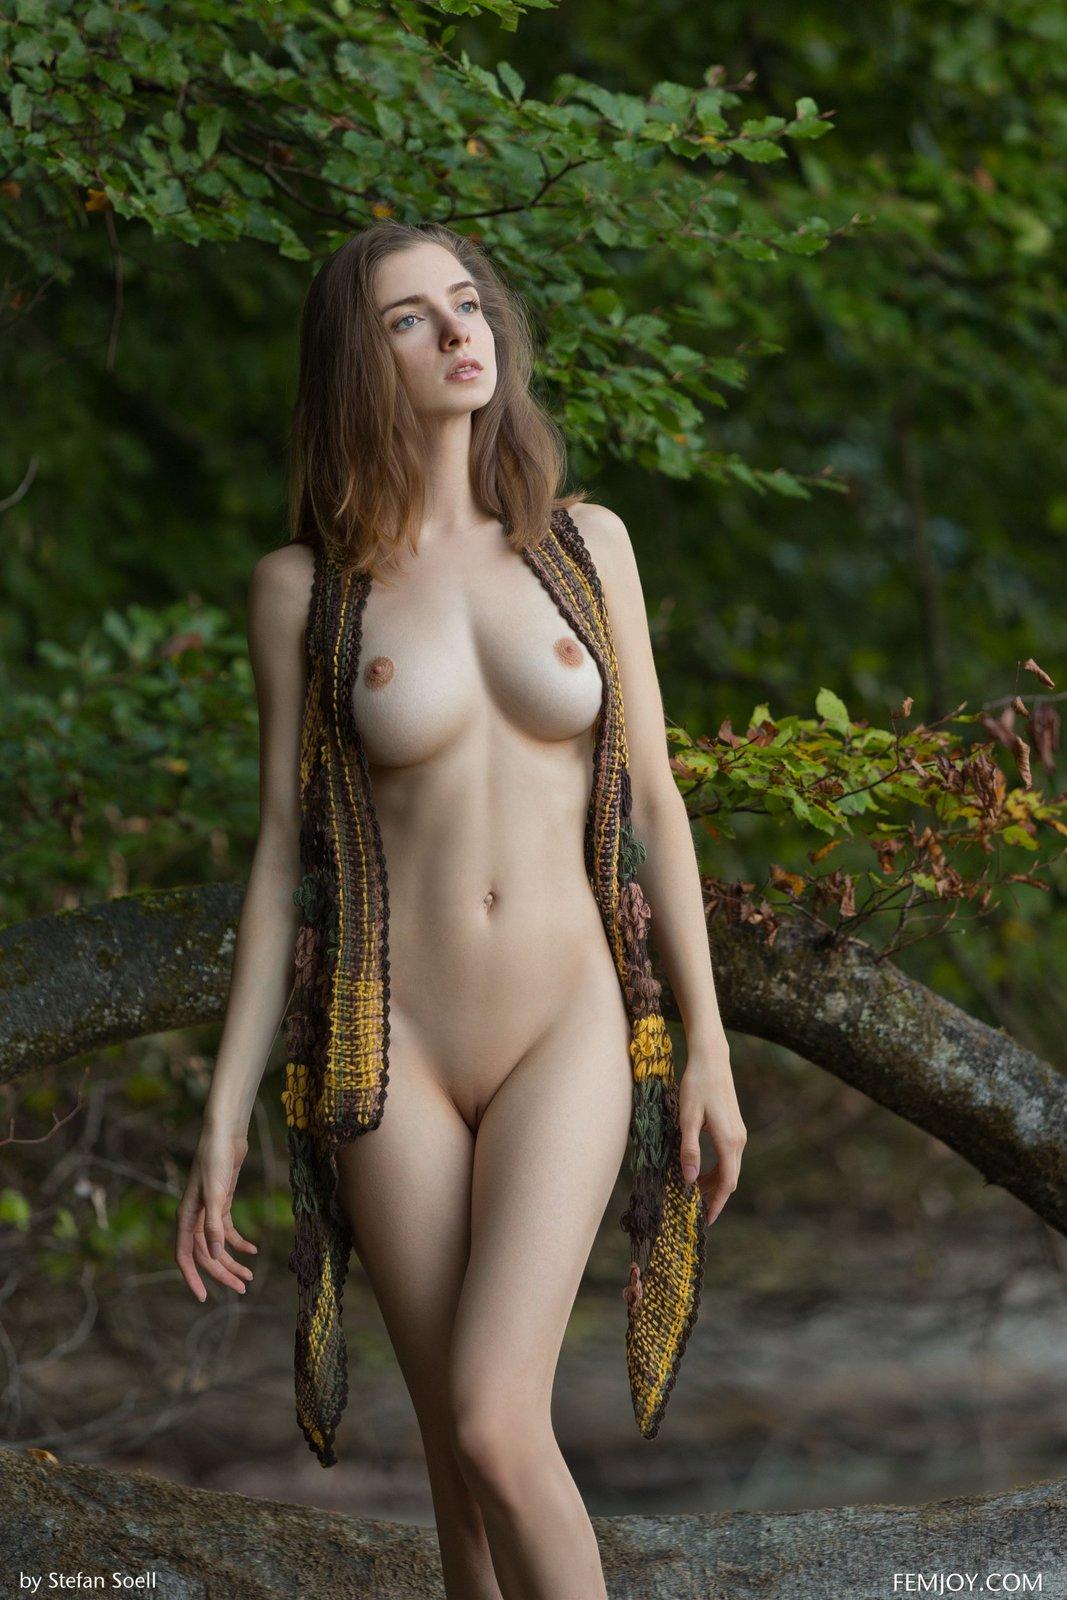 Mariposa In Pure Magic By Femjoy 12 Photos  Erotic Beauties-9994